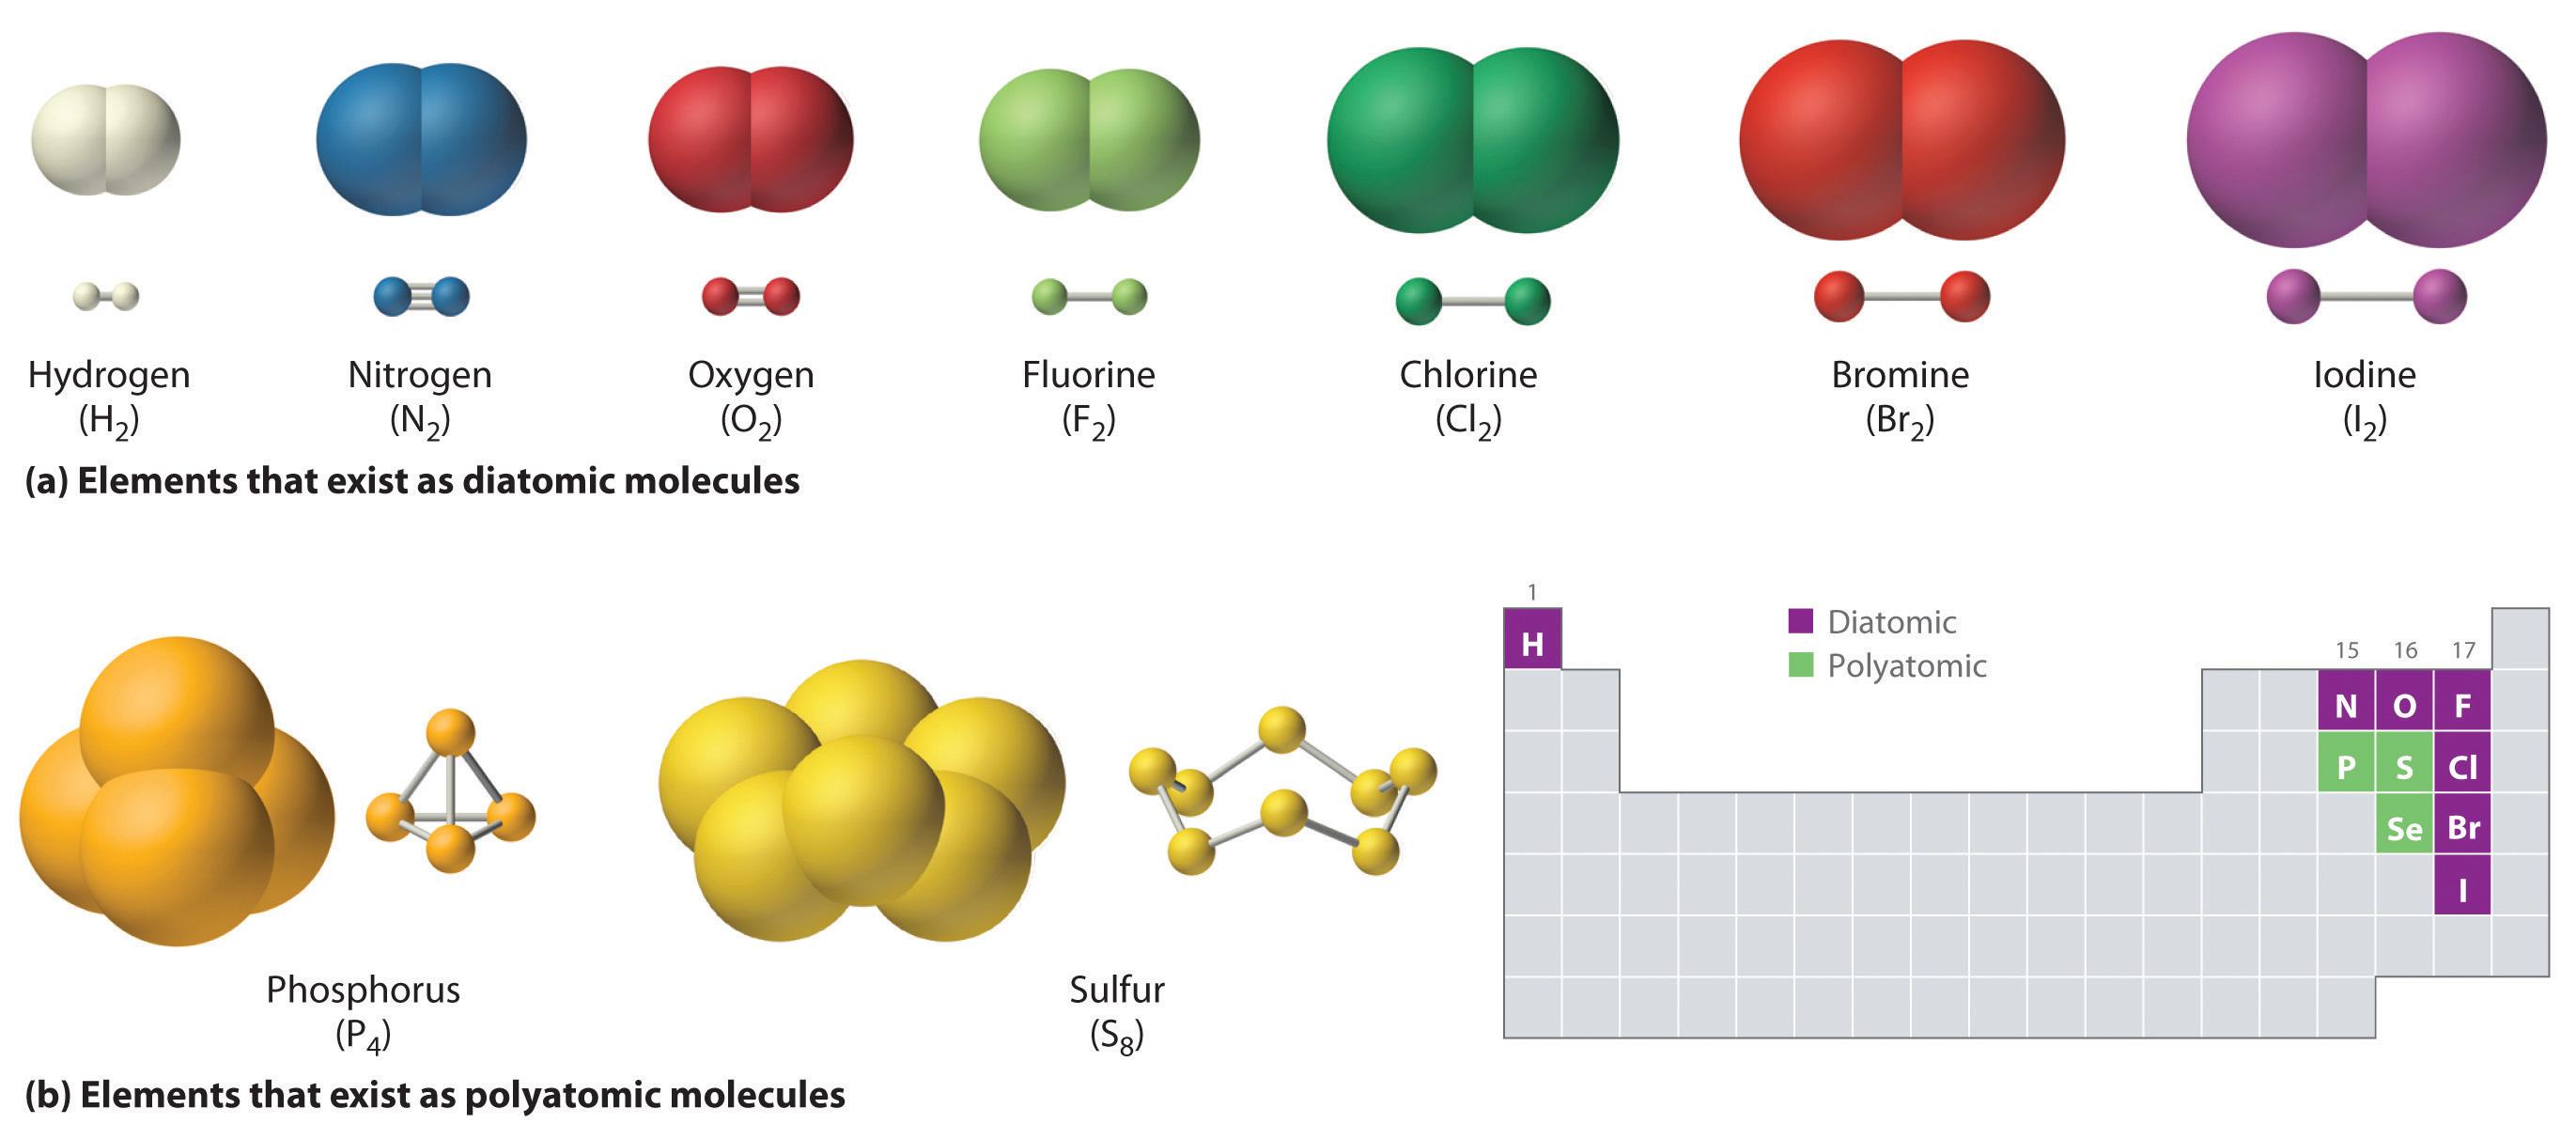 Ch150 Chapter 4 Covalent Bonds And Molecular Compounds Chemistry